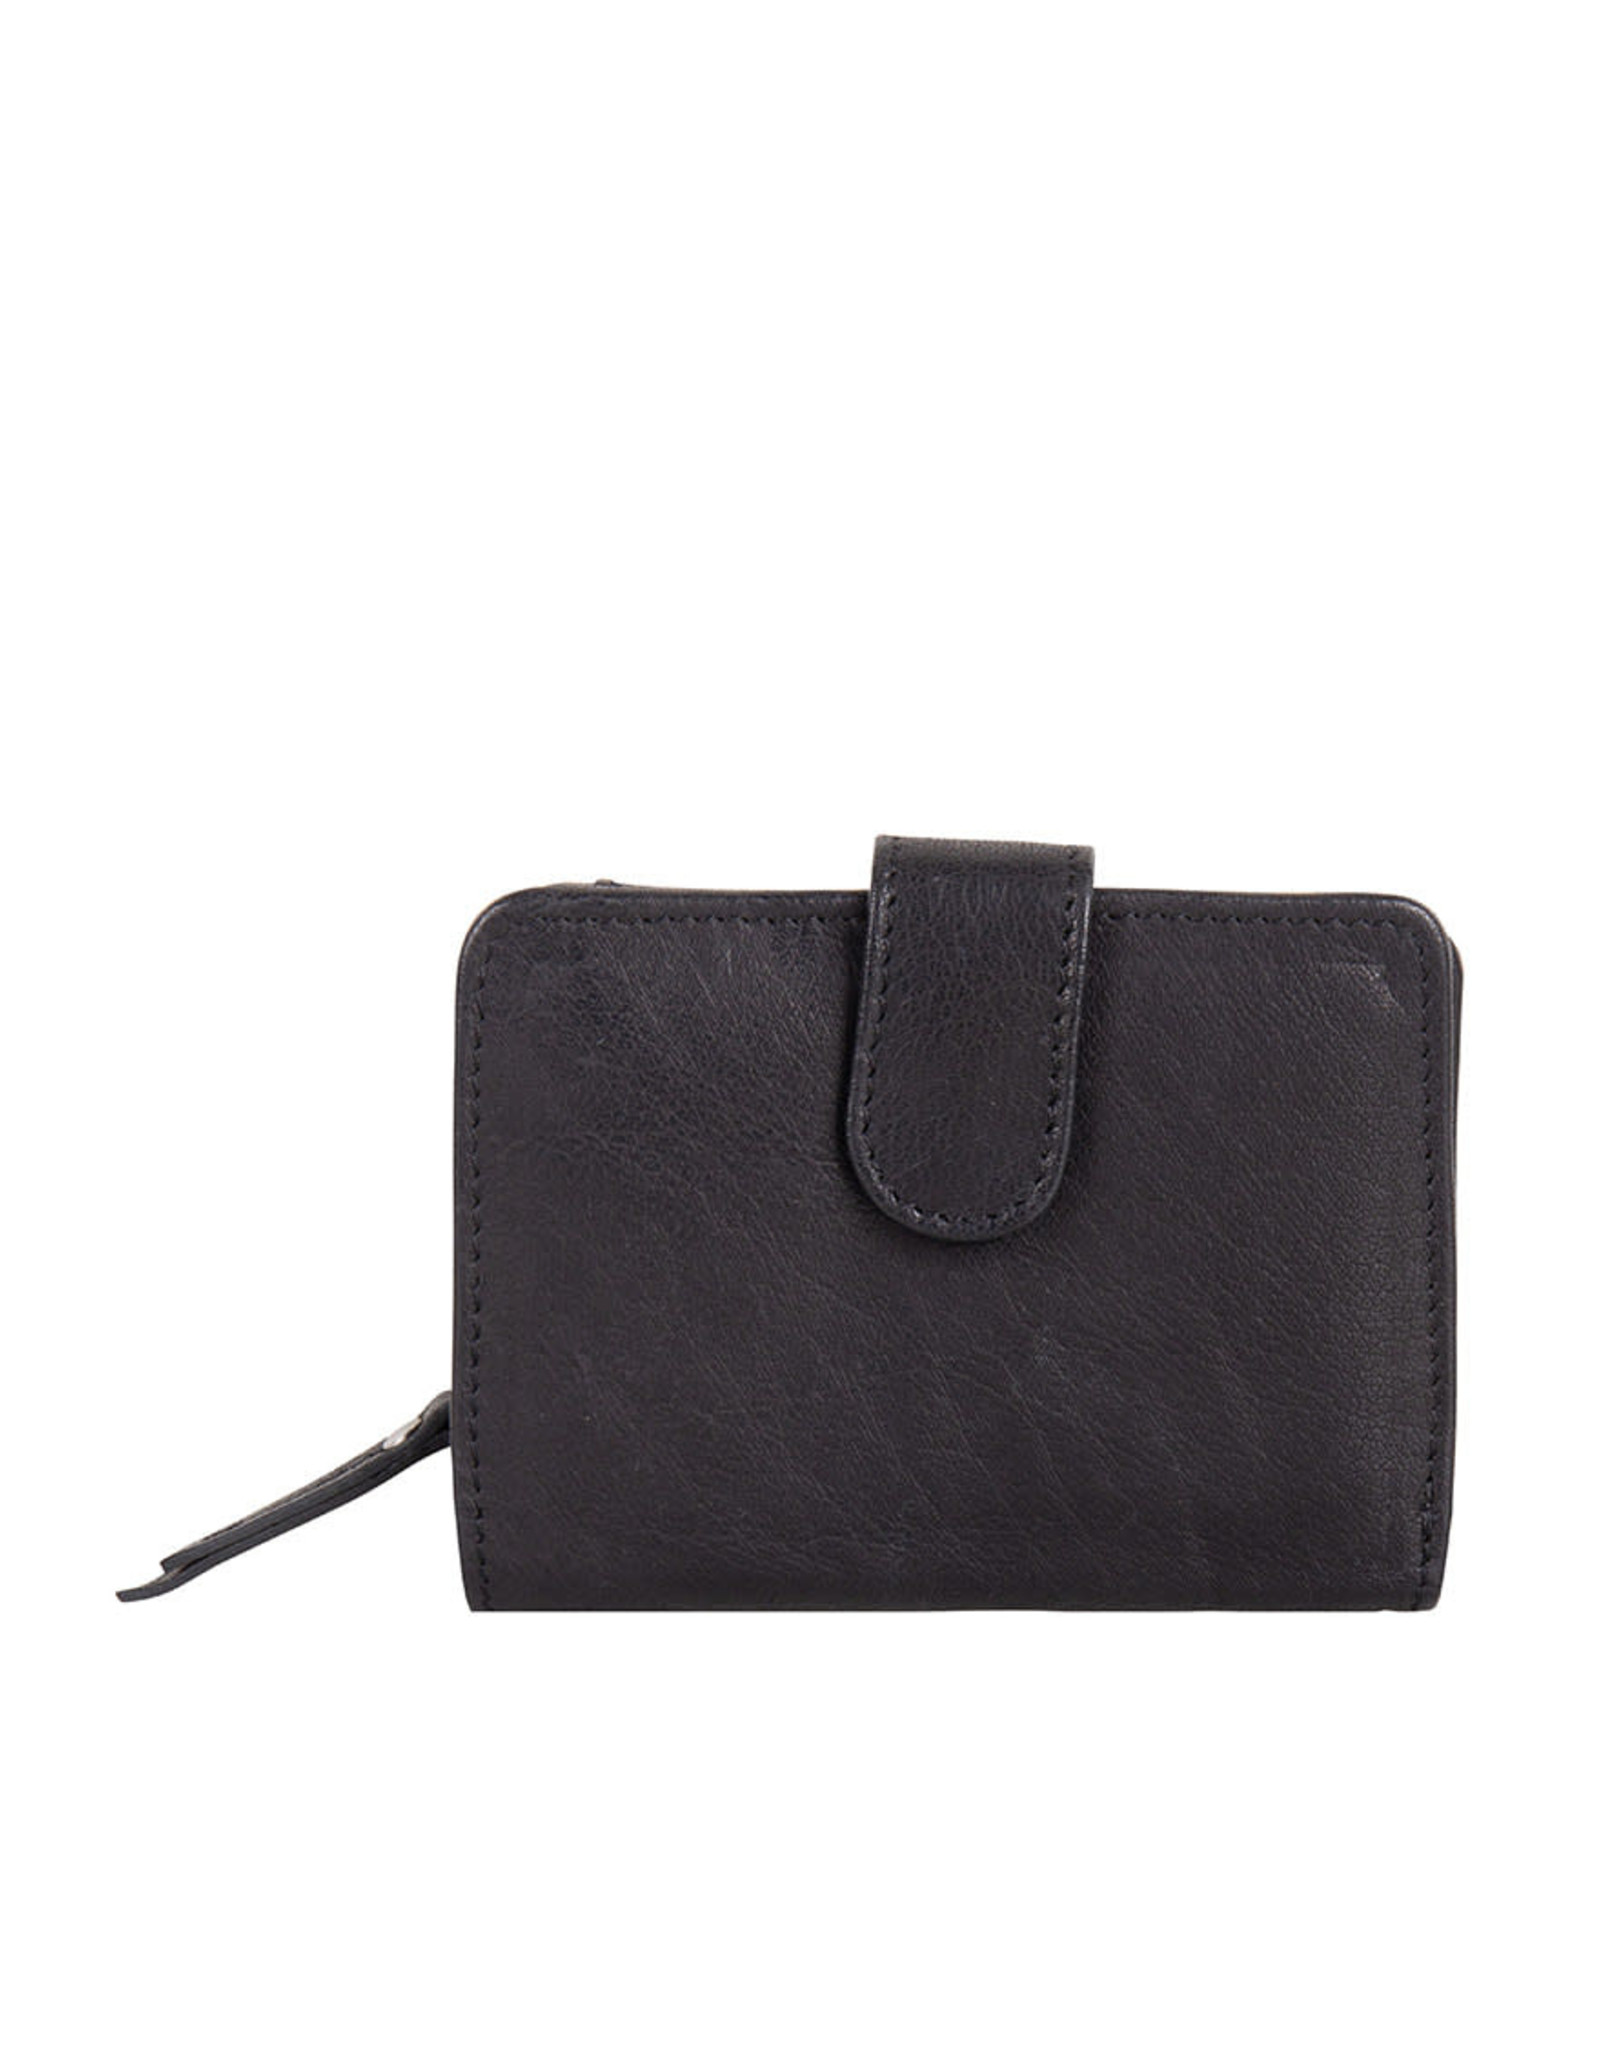 Chabo Chabo Bags  Lola Wallet Black